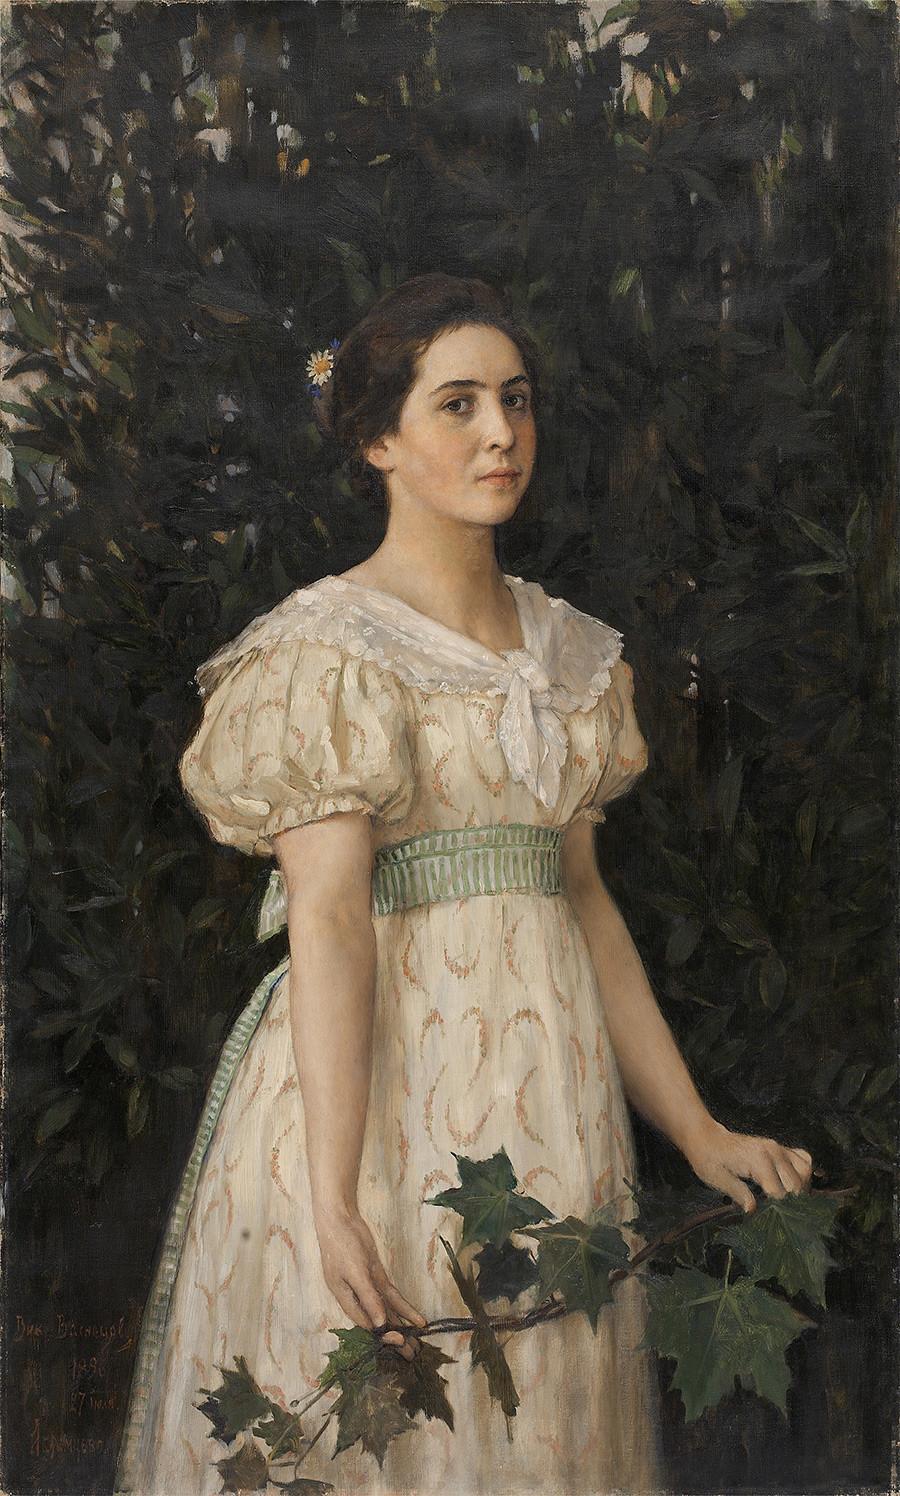 """Garota com um ramo de bordo"" (1886), retrato de Vera Mámontova pintado por Víktor Vasnetsov."